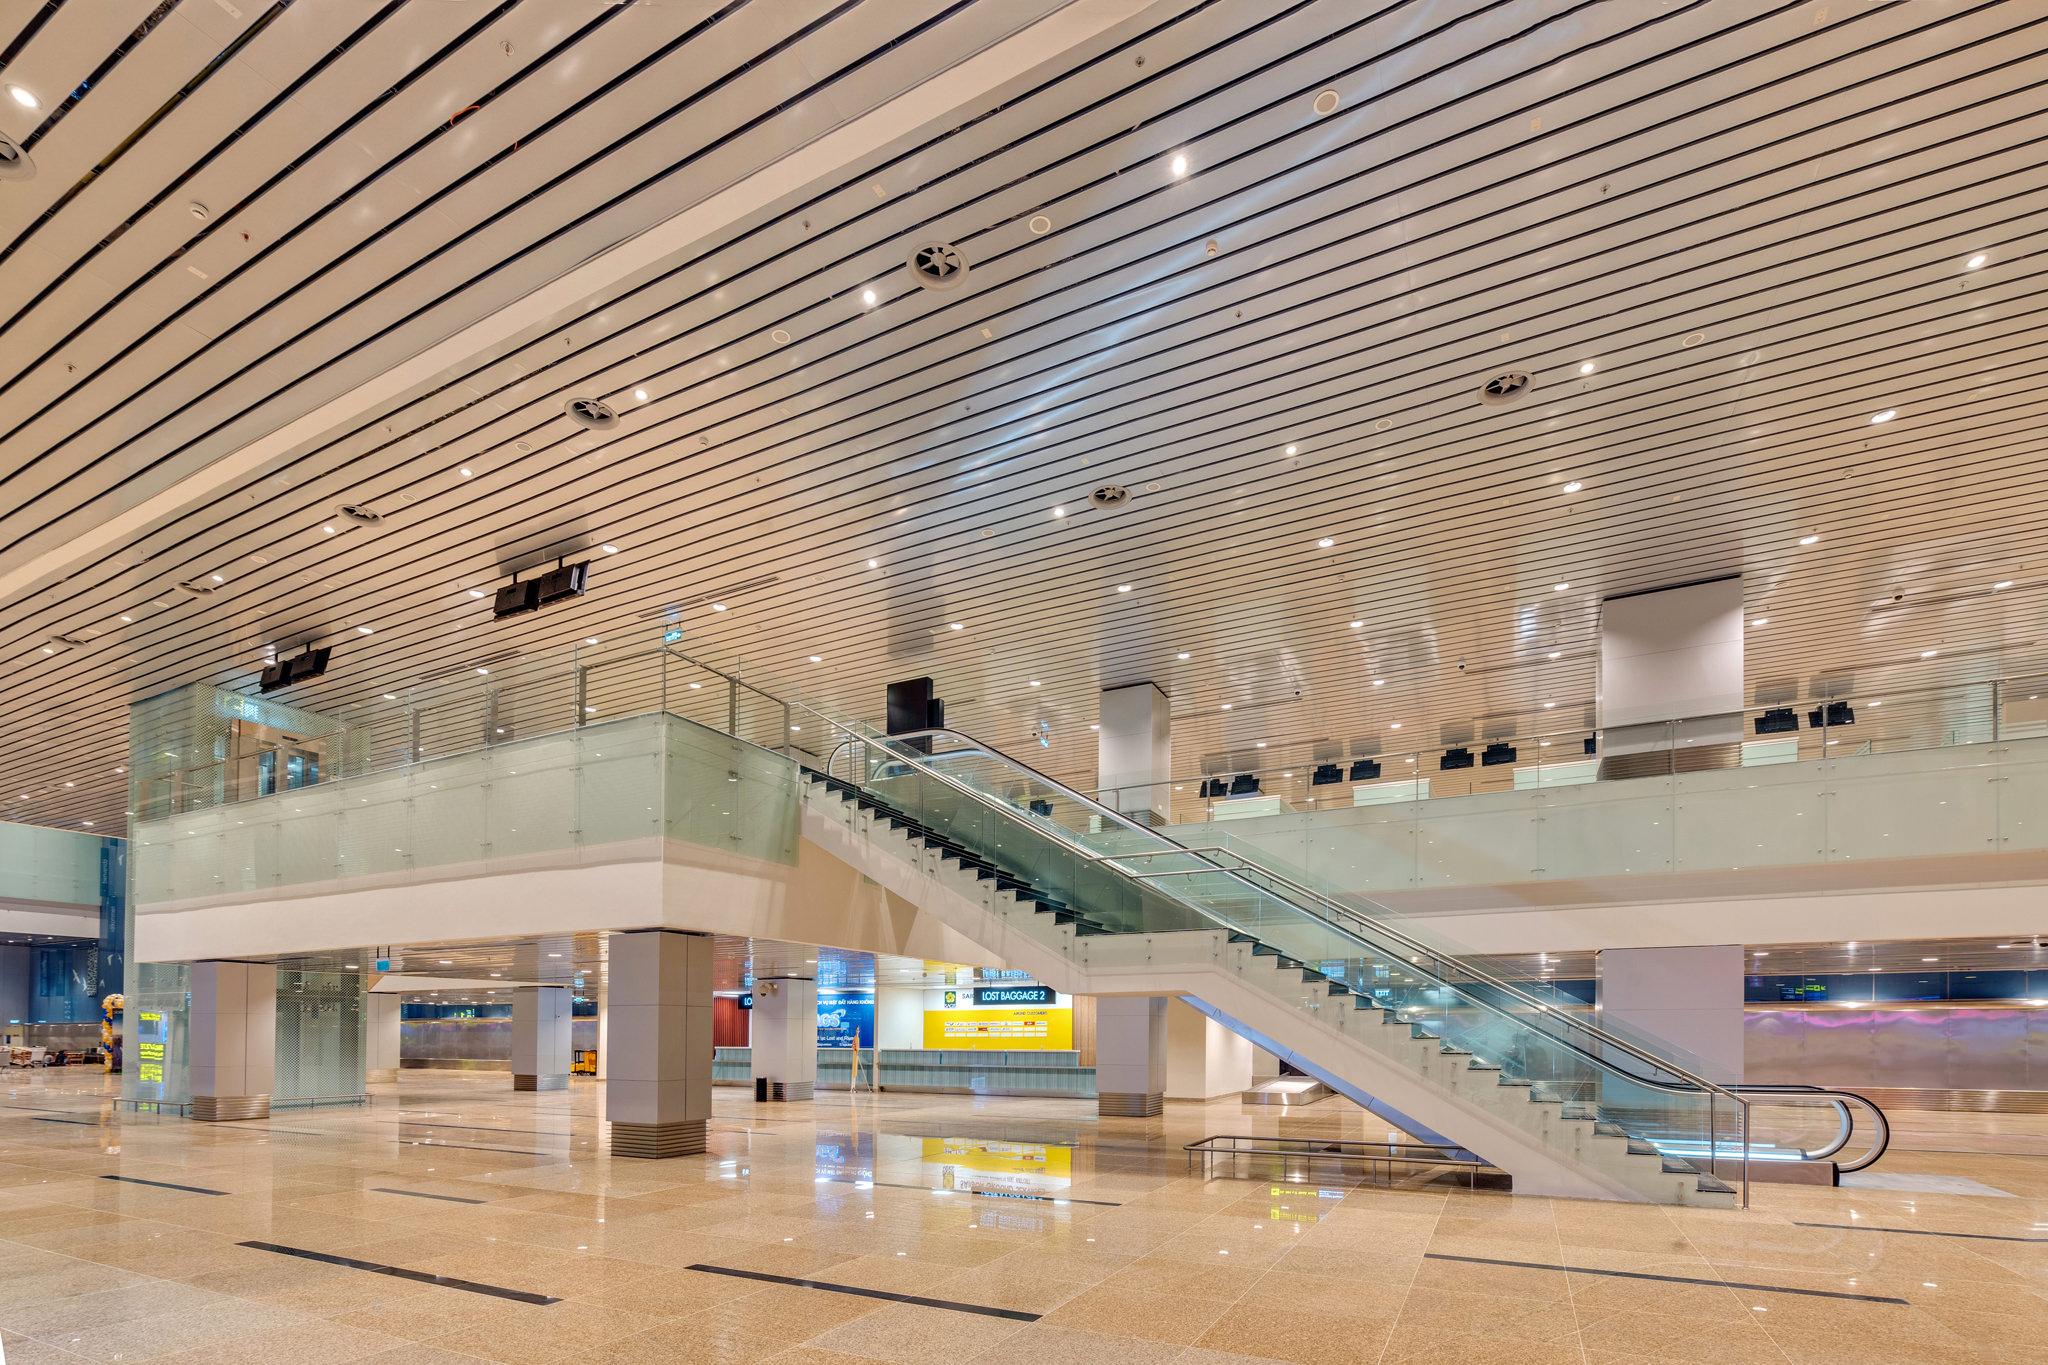 20180626 - Cam Ranh Airport - Architecture - 0413.jpg